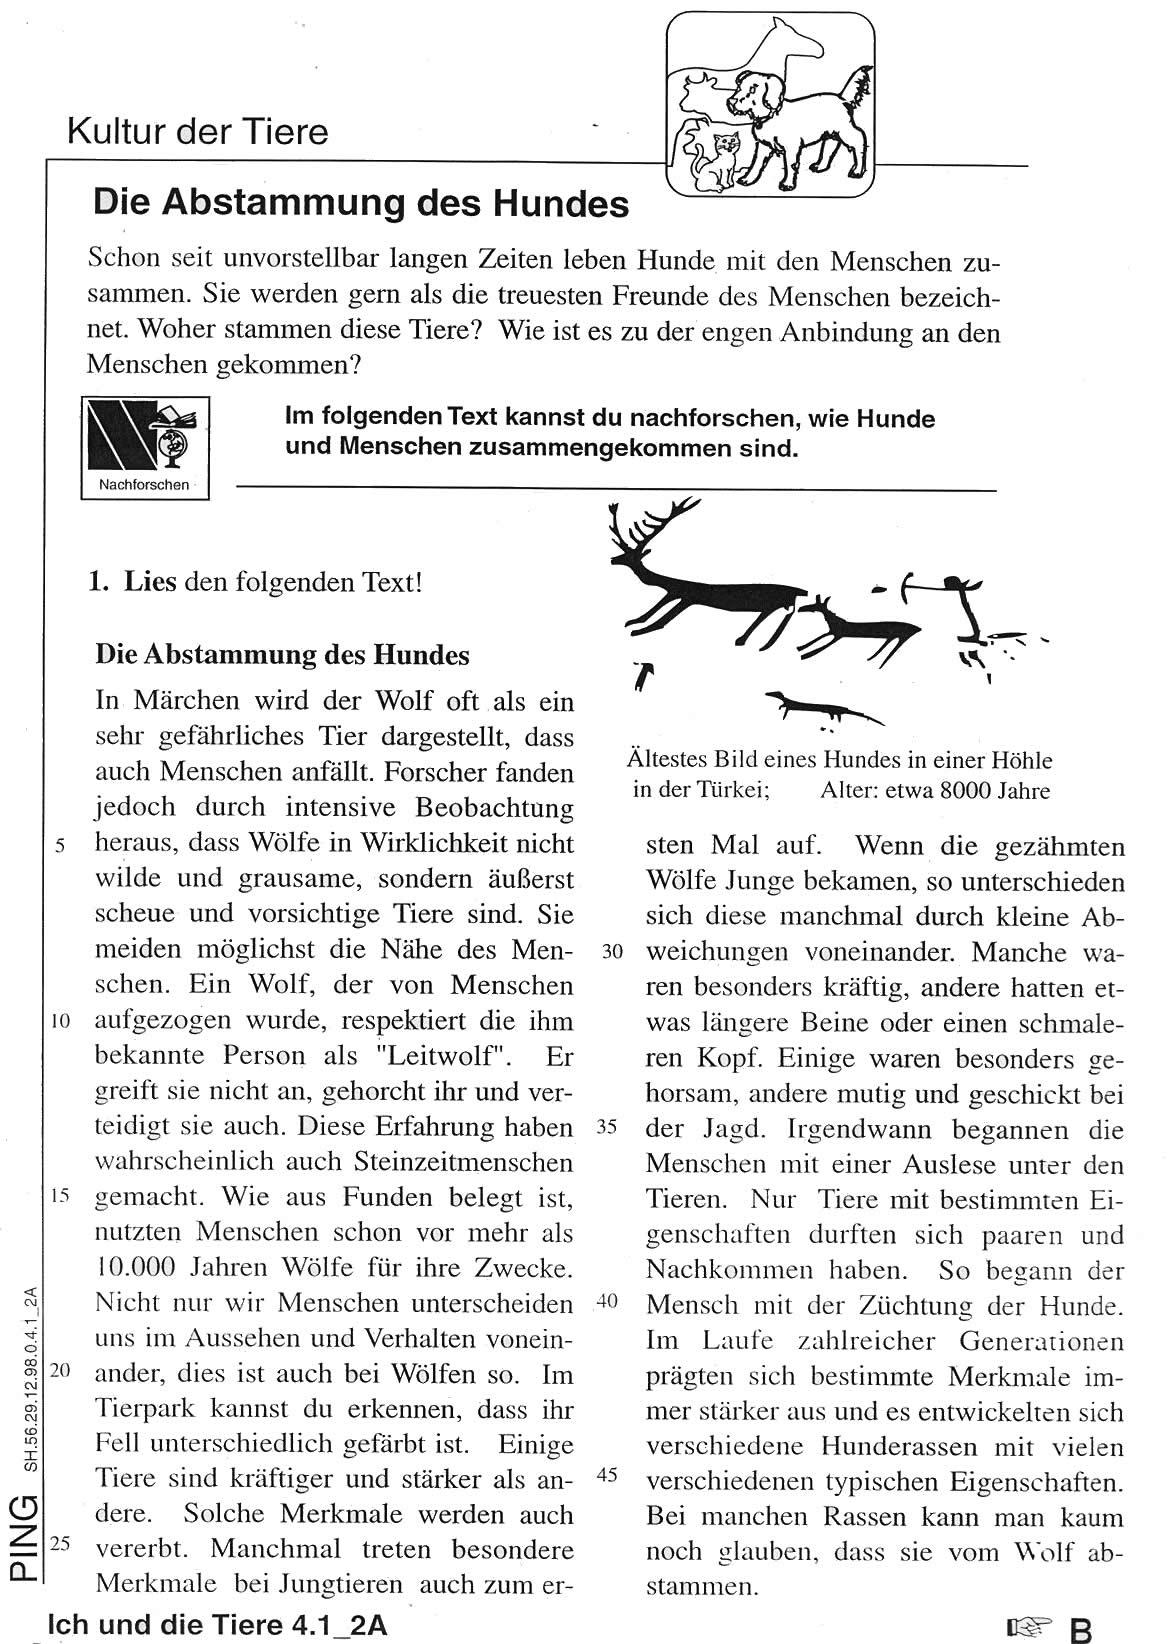 Enchanting Irs Kapitalgewinne Arbeitsblatt Picture Collection ...